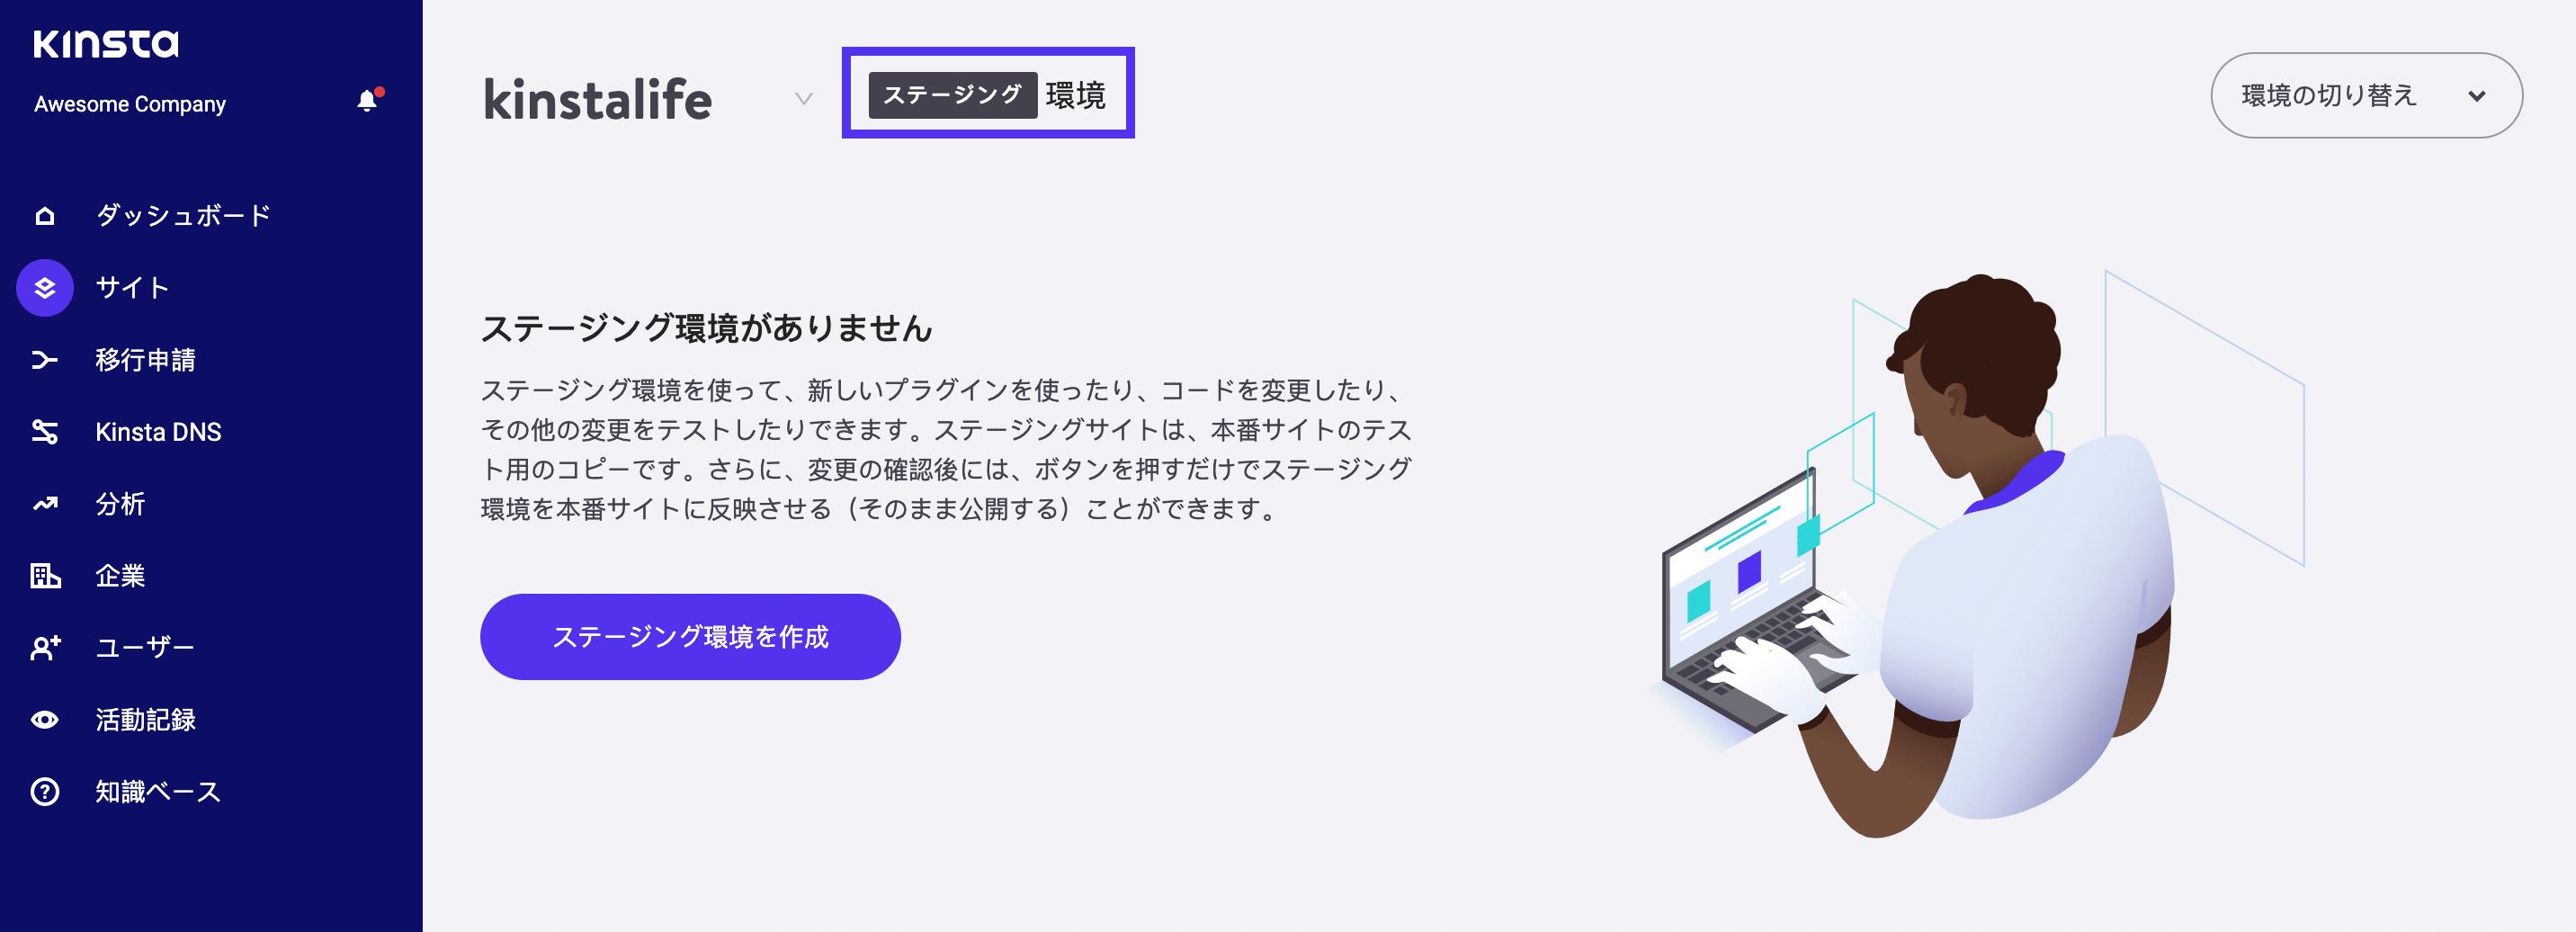 MyKinstaの「サイトの開発者」の管理画面